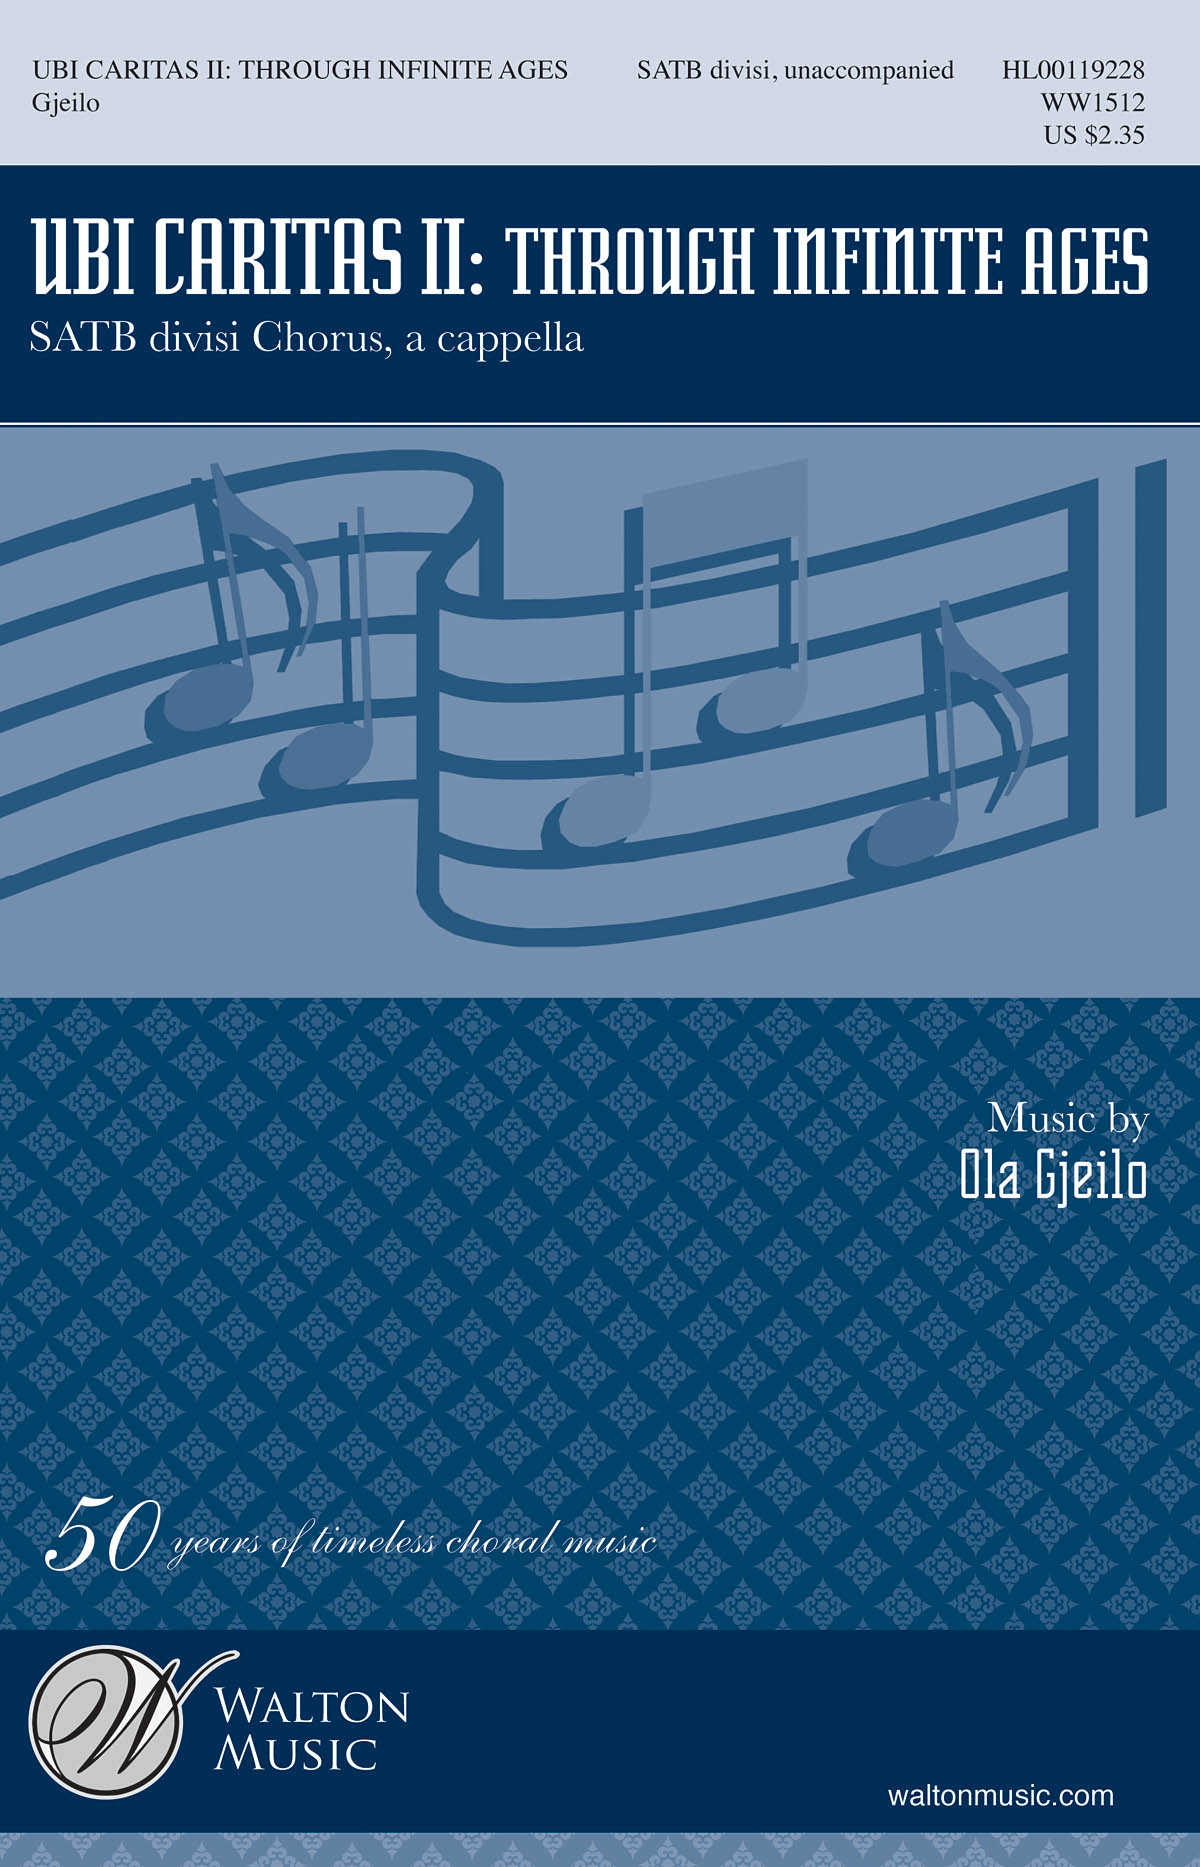 Ola Gjeilo: Ubi Caritas II: Through Infinite Ages: Mixed Choir a Cappella: Vocal